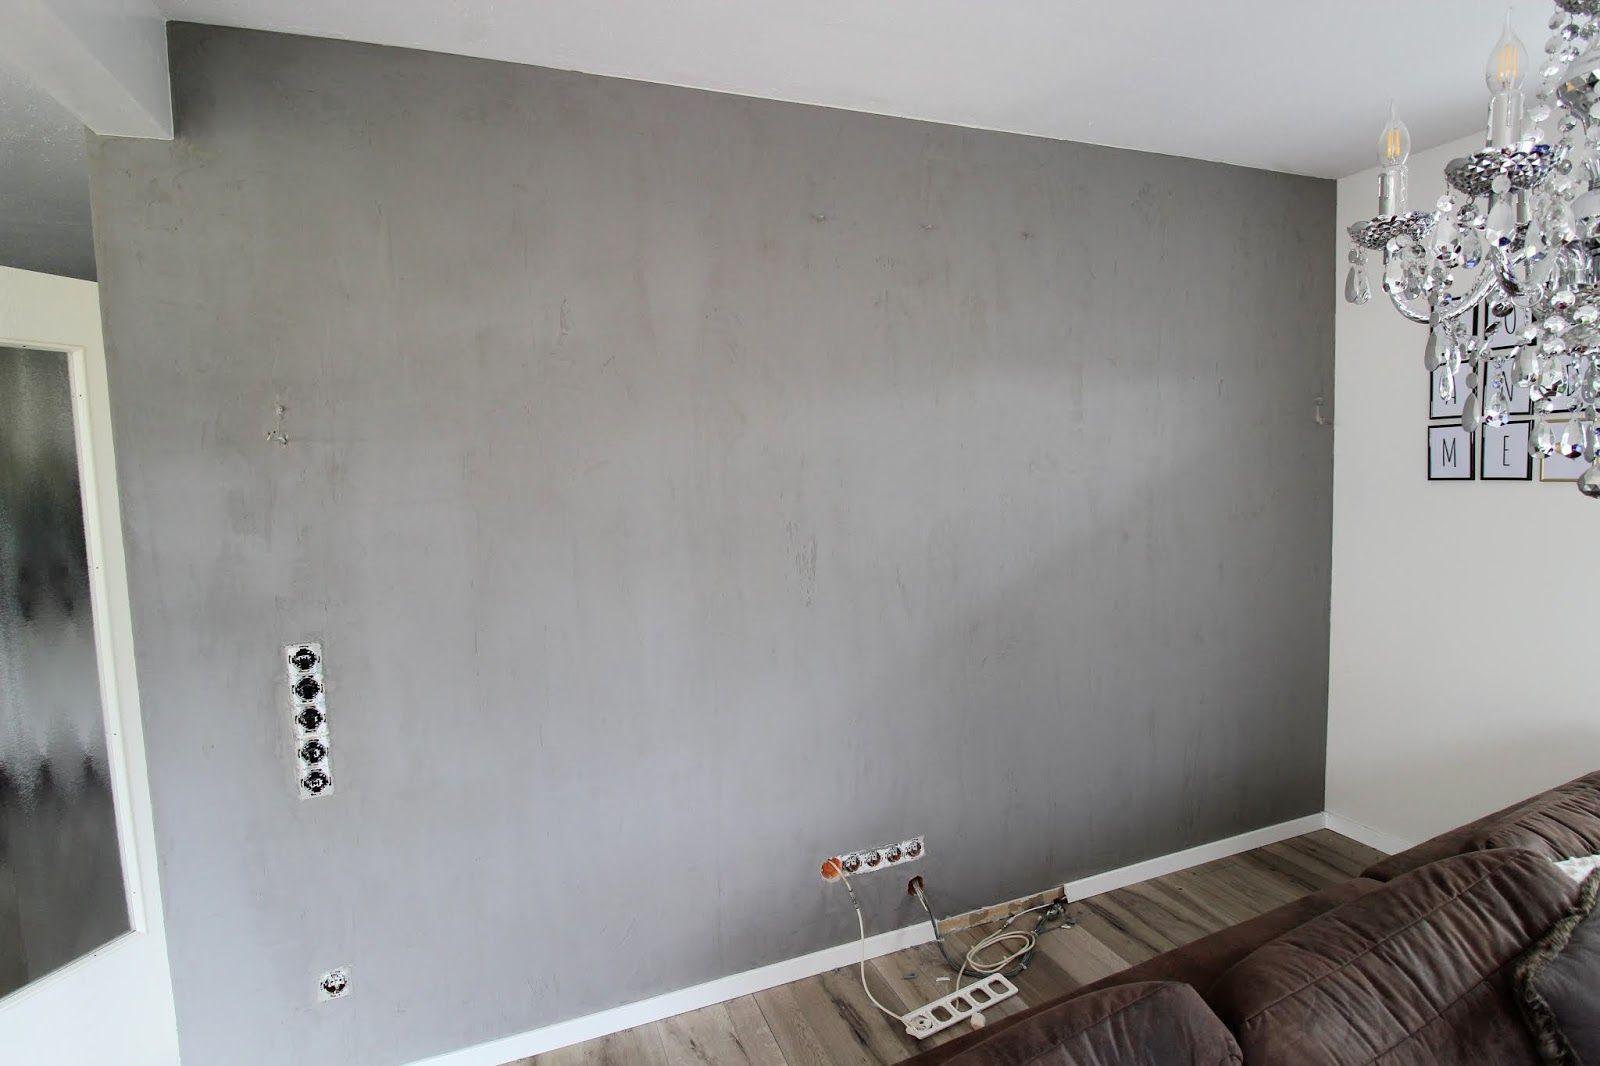 Diy Wandgestaltung In Beton Optik So Einfach Geht Es Diy Wandgestaltung Wandgestaltung Betonoptik Wandgestaltung